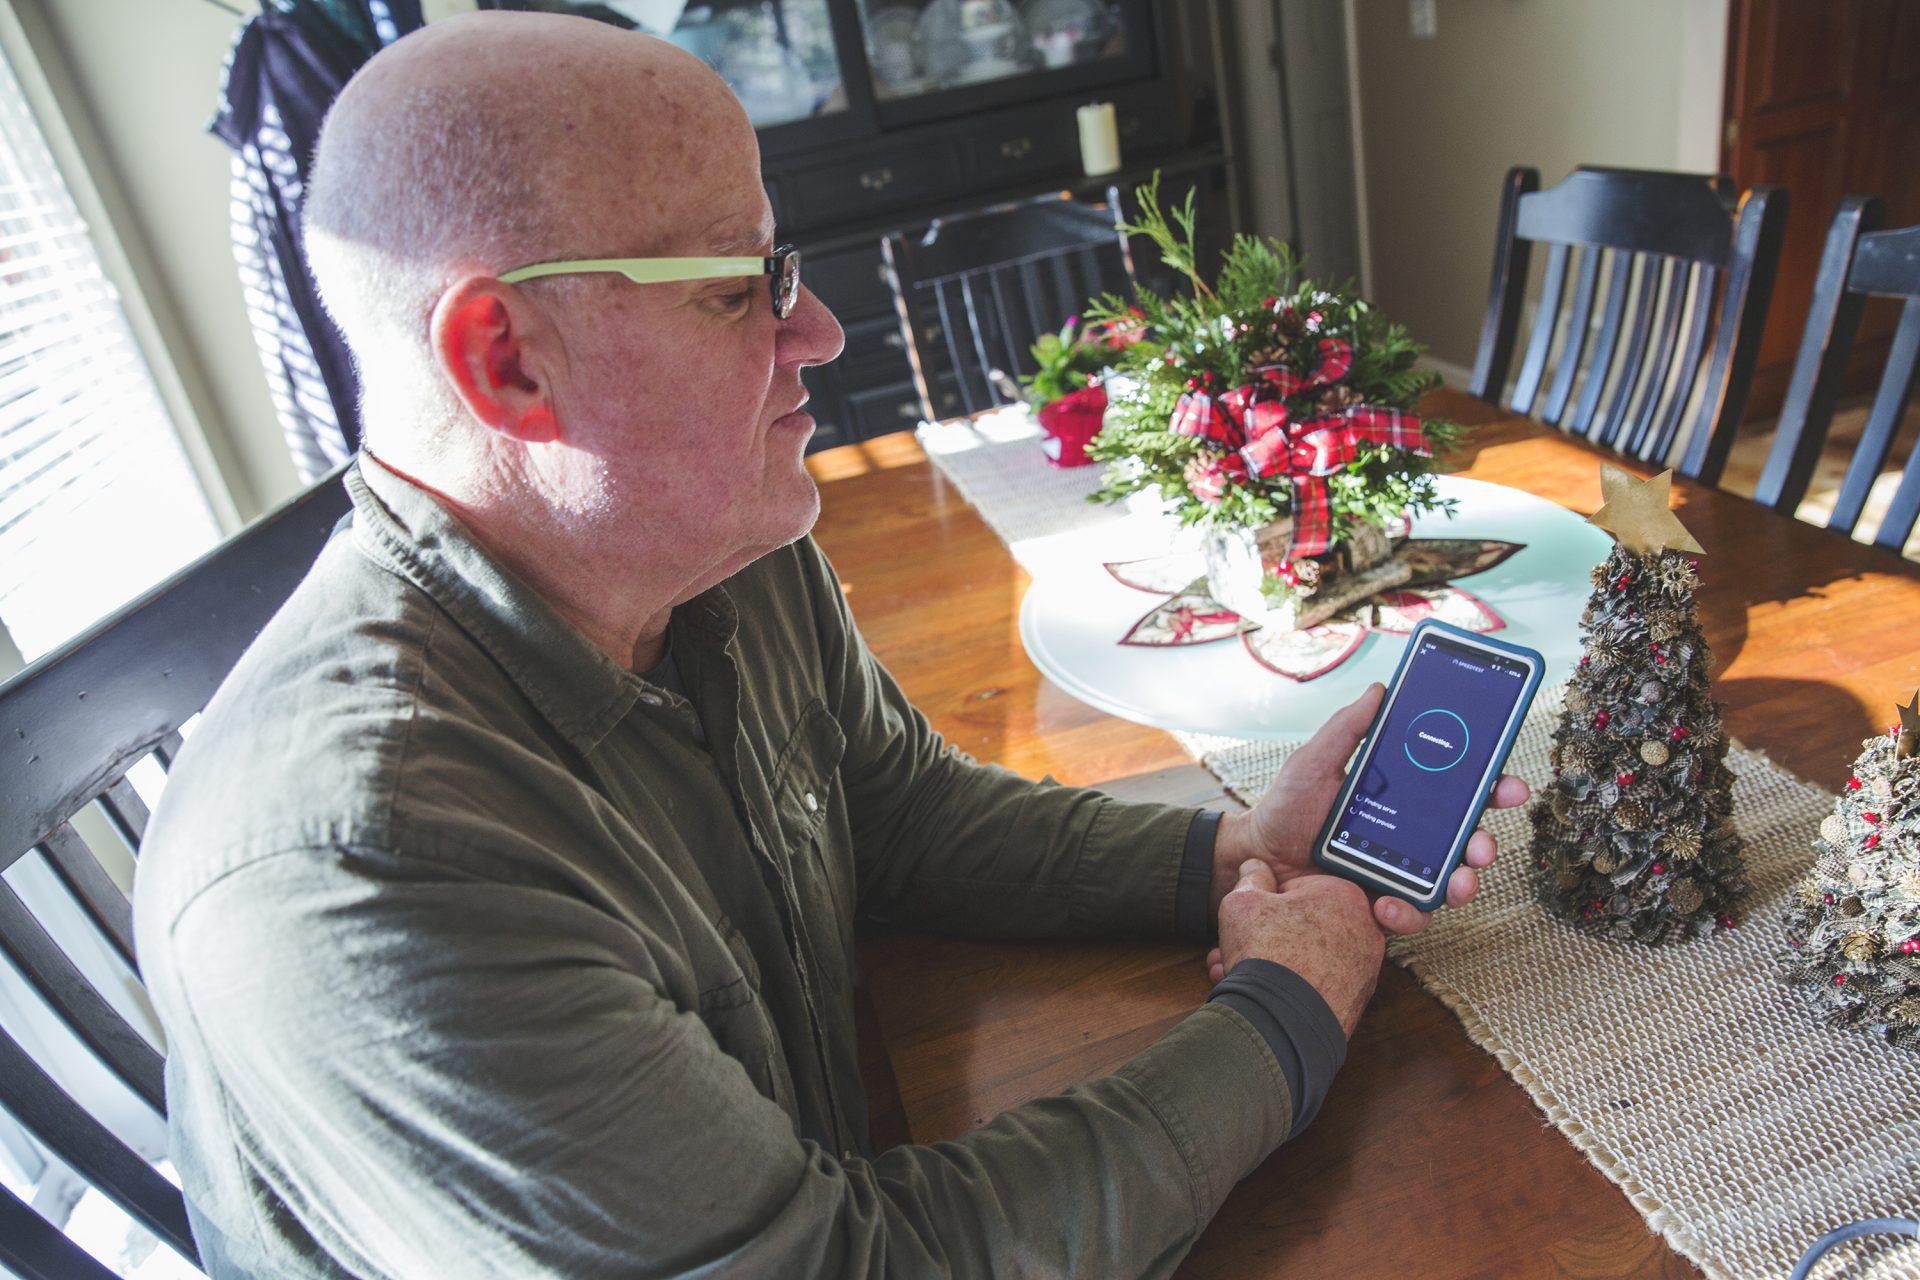 Tom Bracken, a volunteer at the cooperative, tests the DSL internet speeds at home.